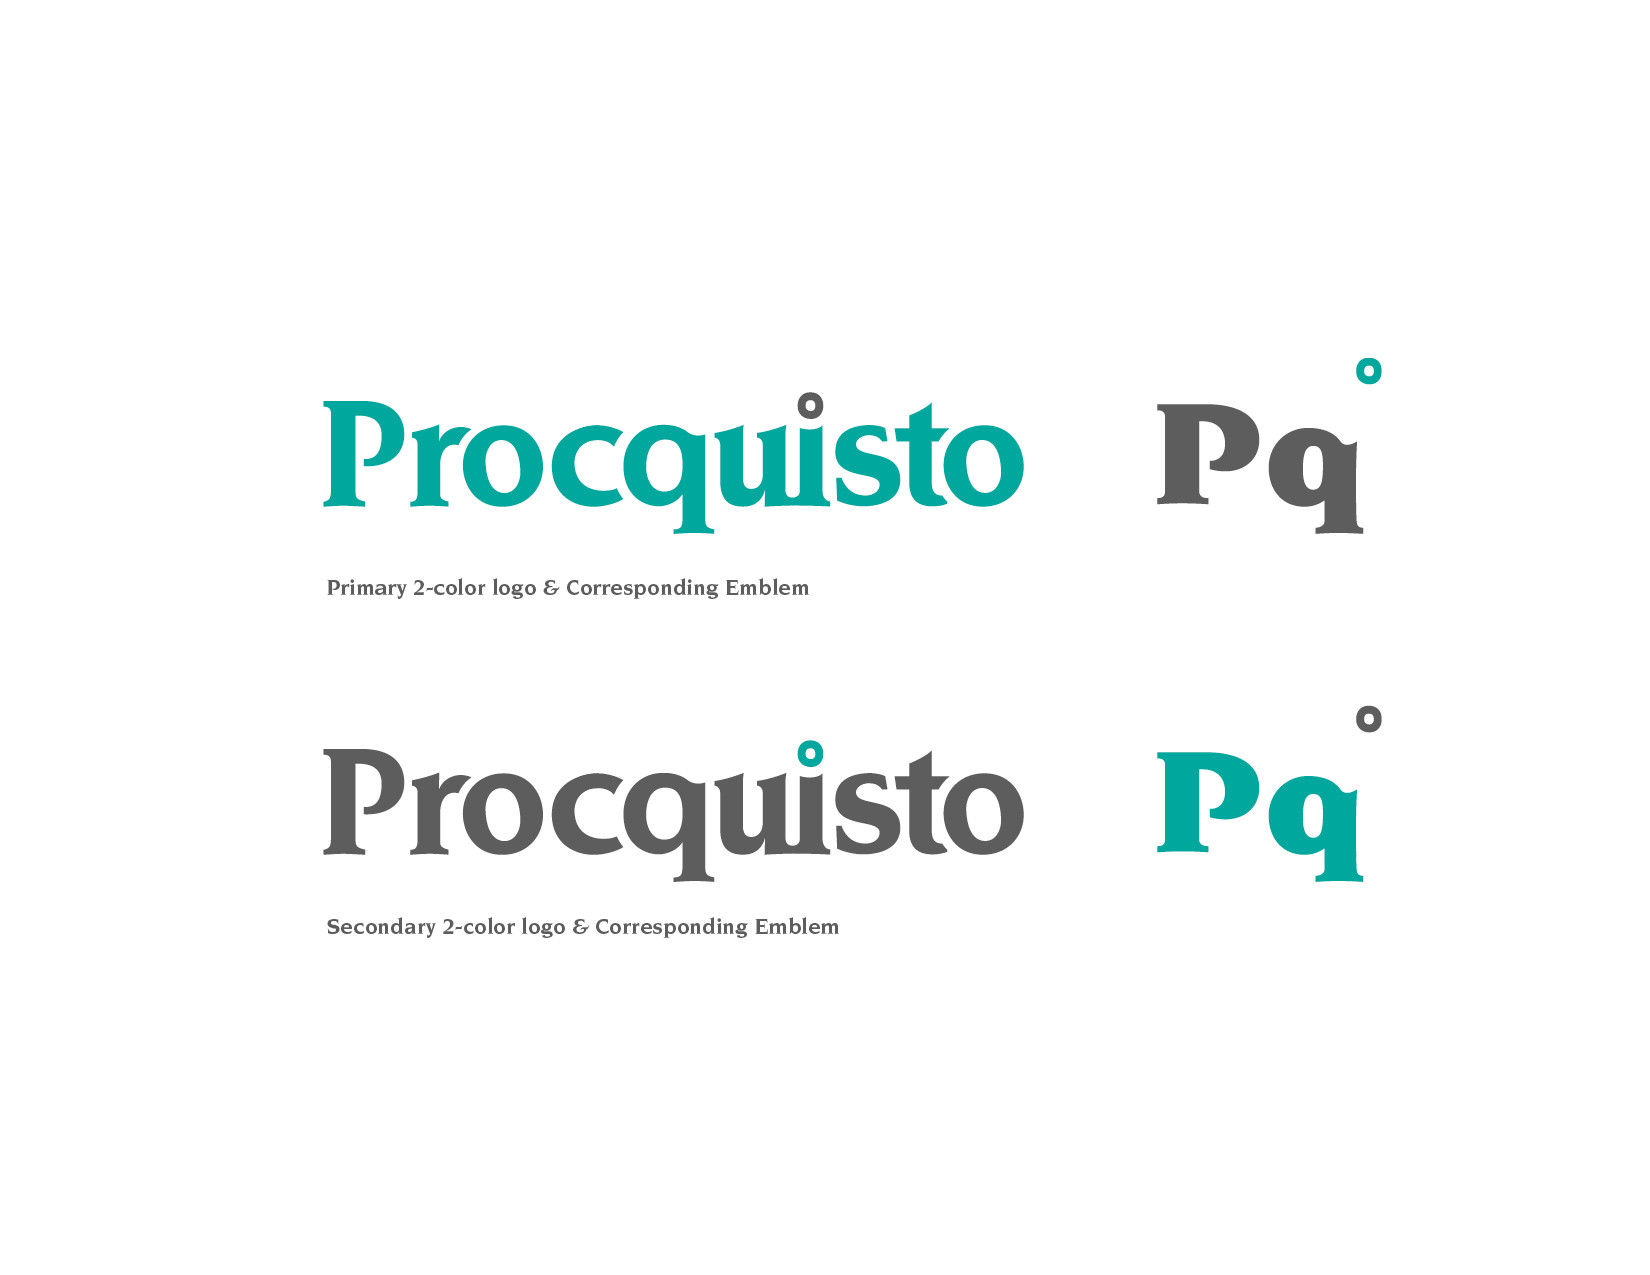 ProcquistoIdentity.jpg